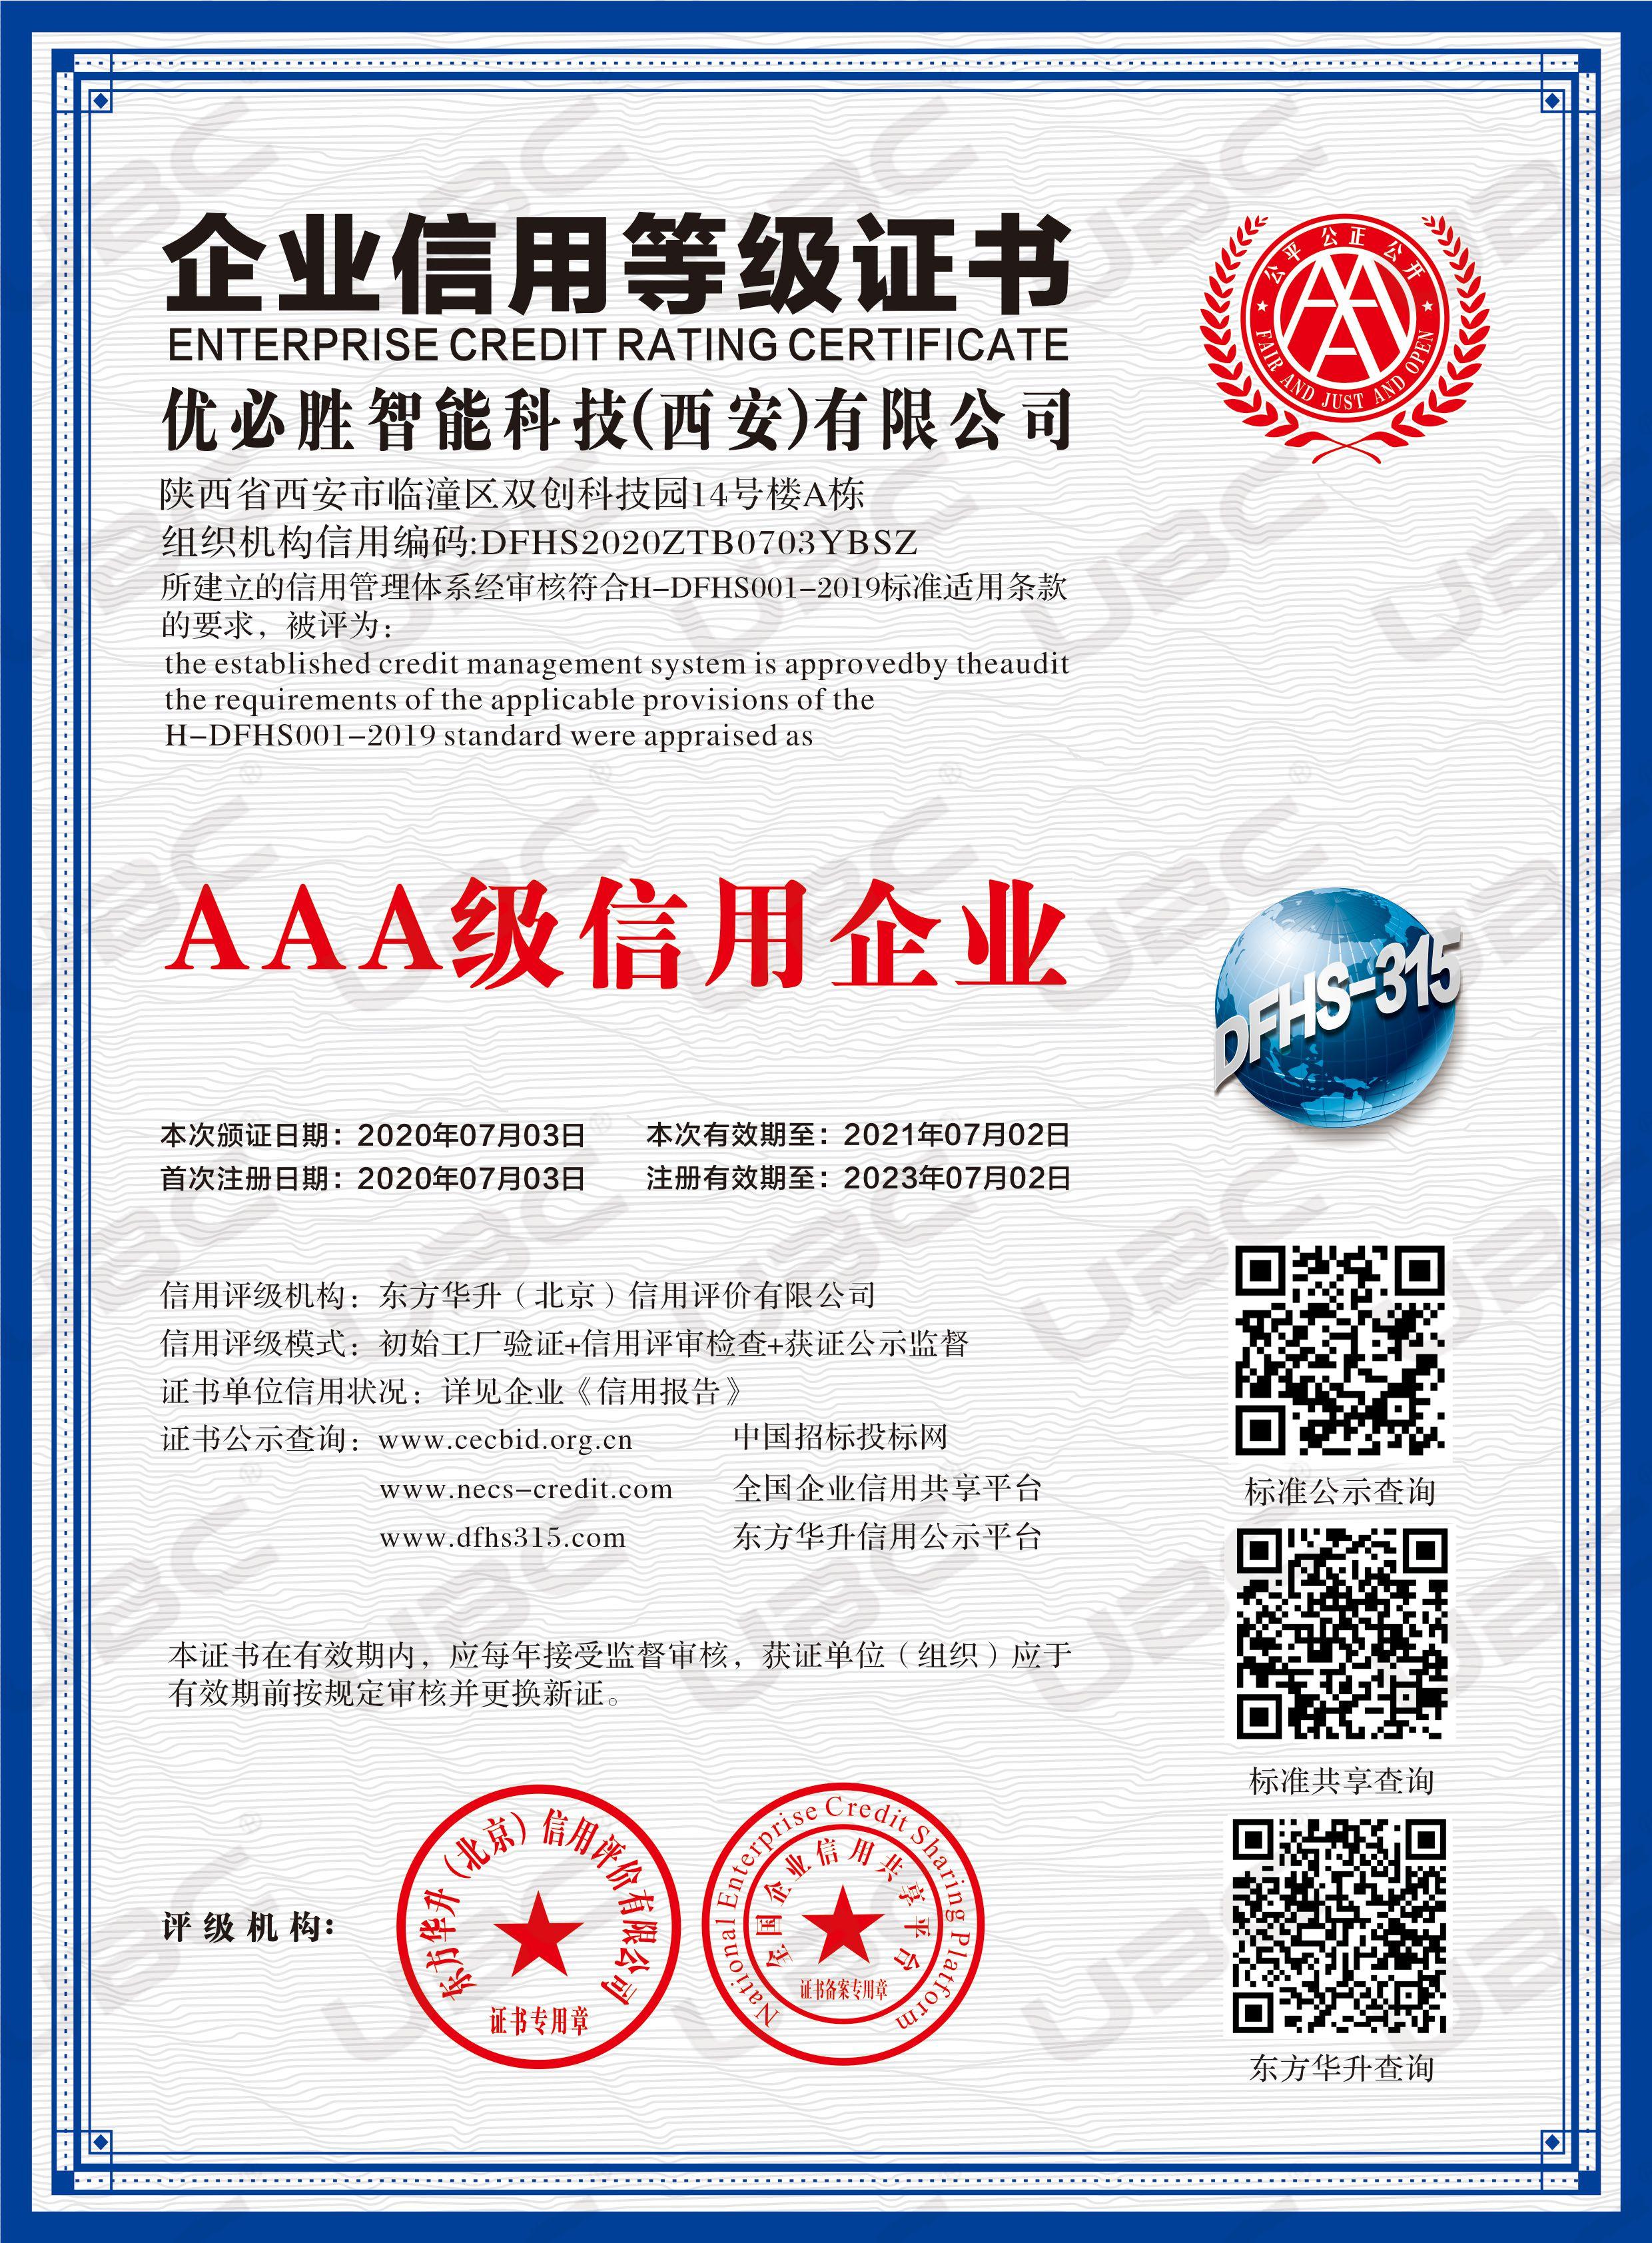 AAA credit enterprise certification